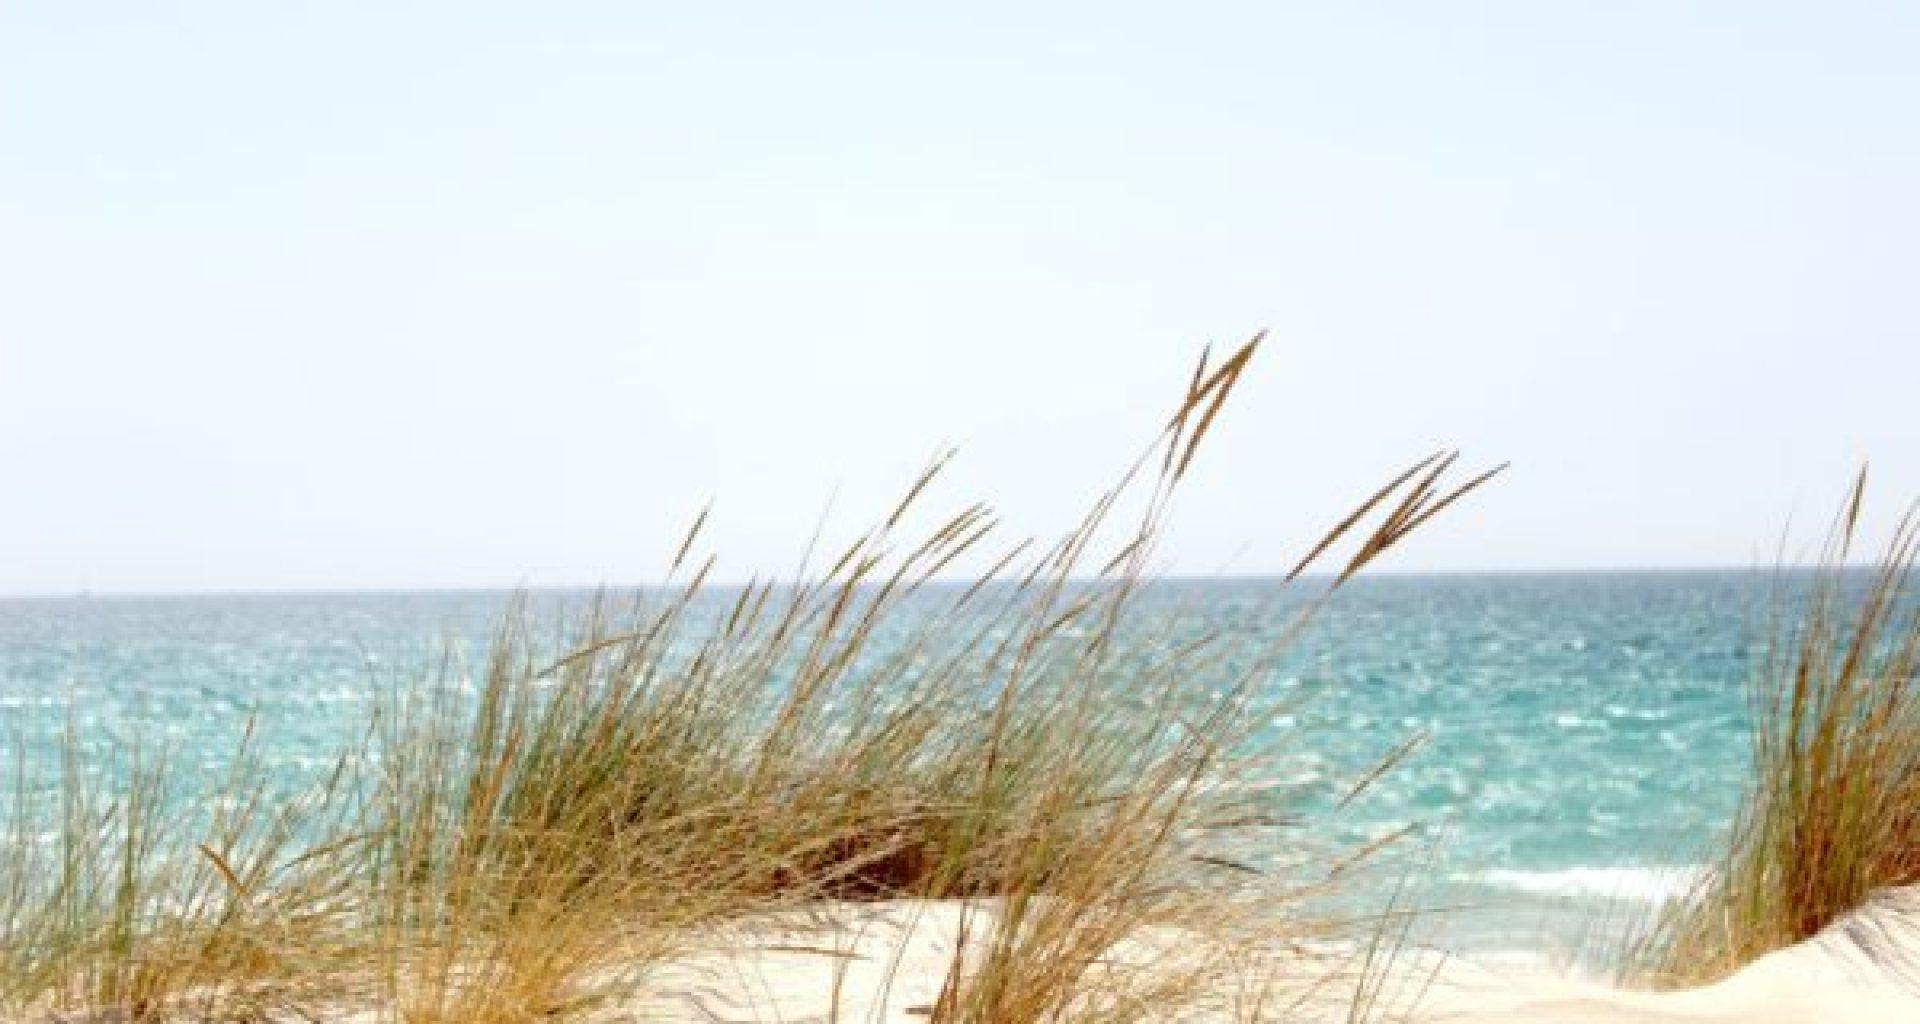 grass-beside-the-sea-662994